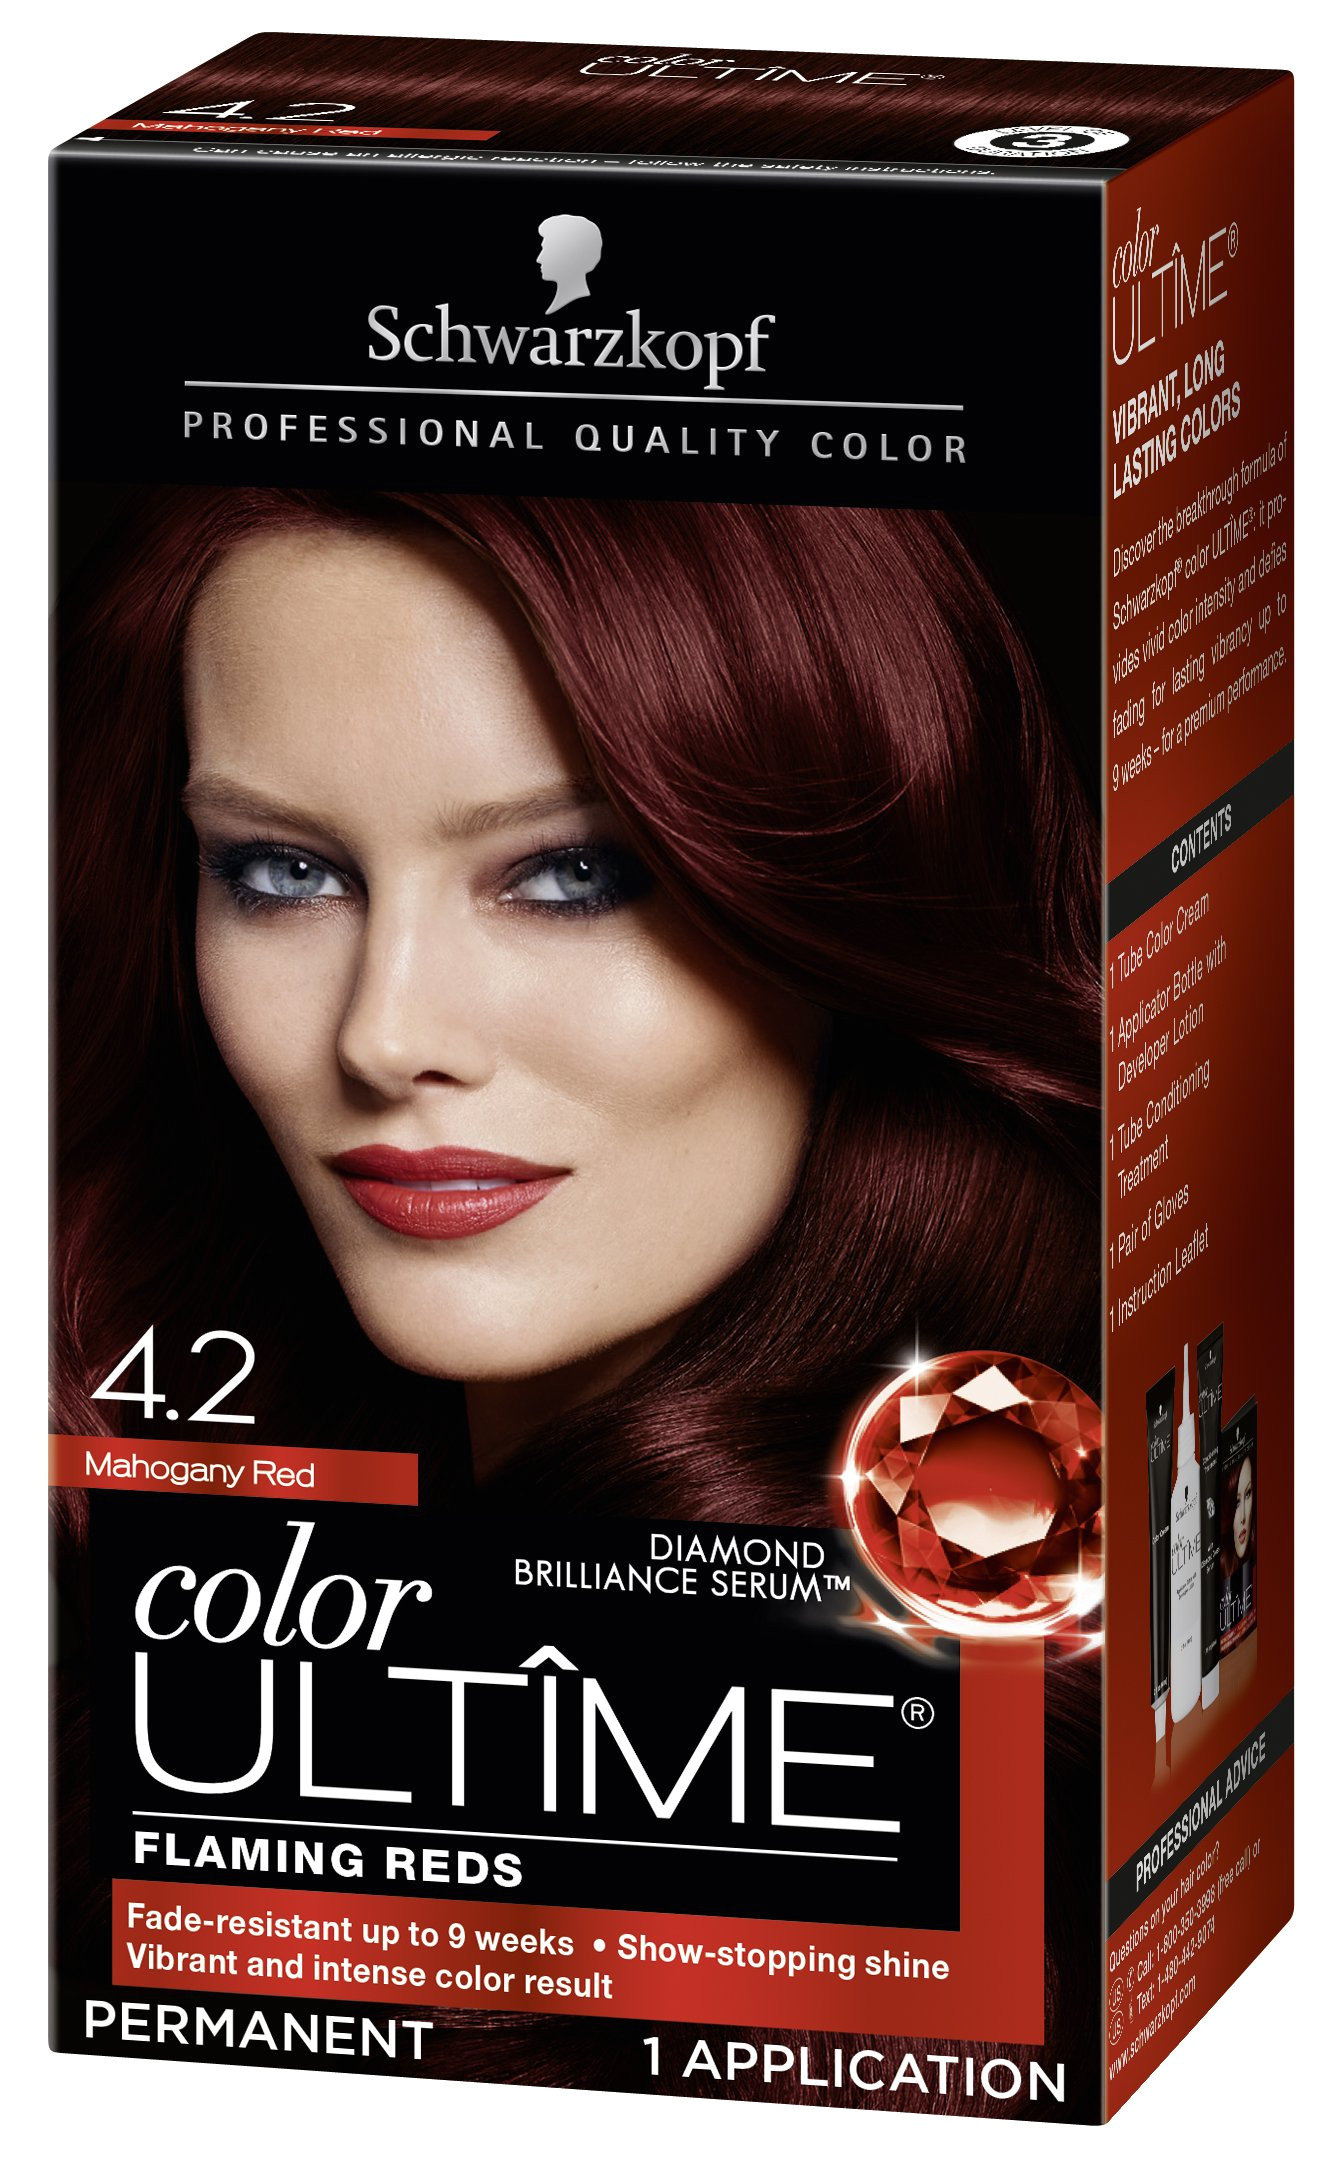 schwarzkopf ultime hair color cream 4 2 mahogany red 5 7 ounces